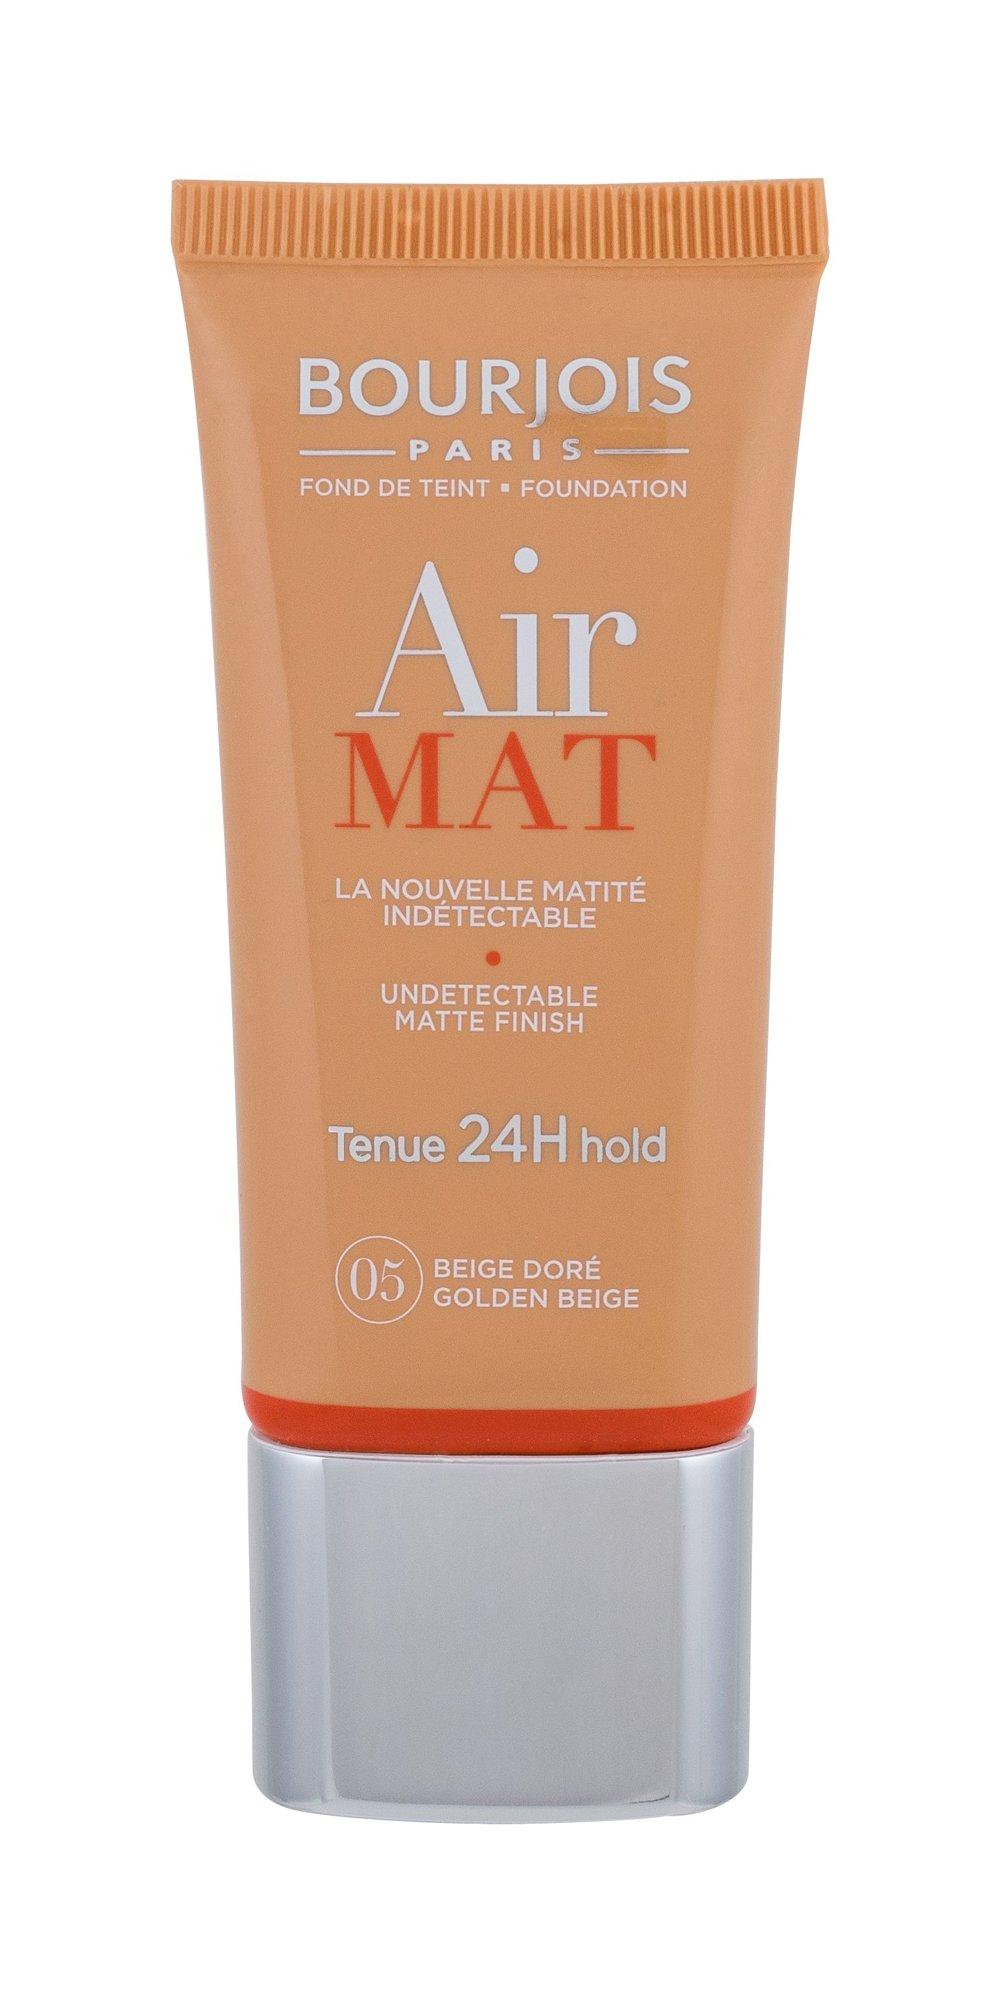 BOURJOIS Paris Air Mat Cosmetic 30ml 05 Golden Beige